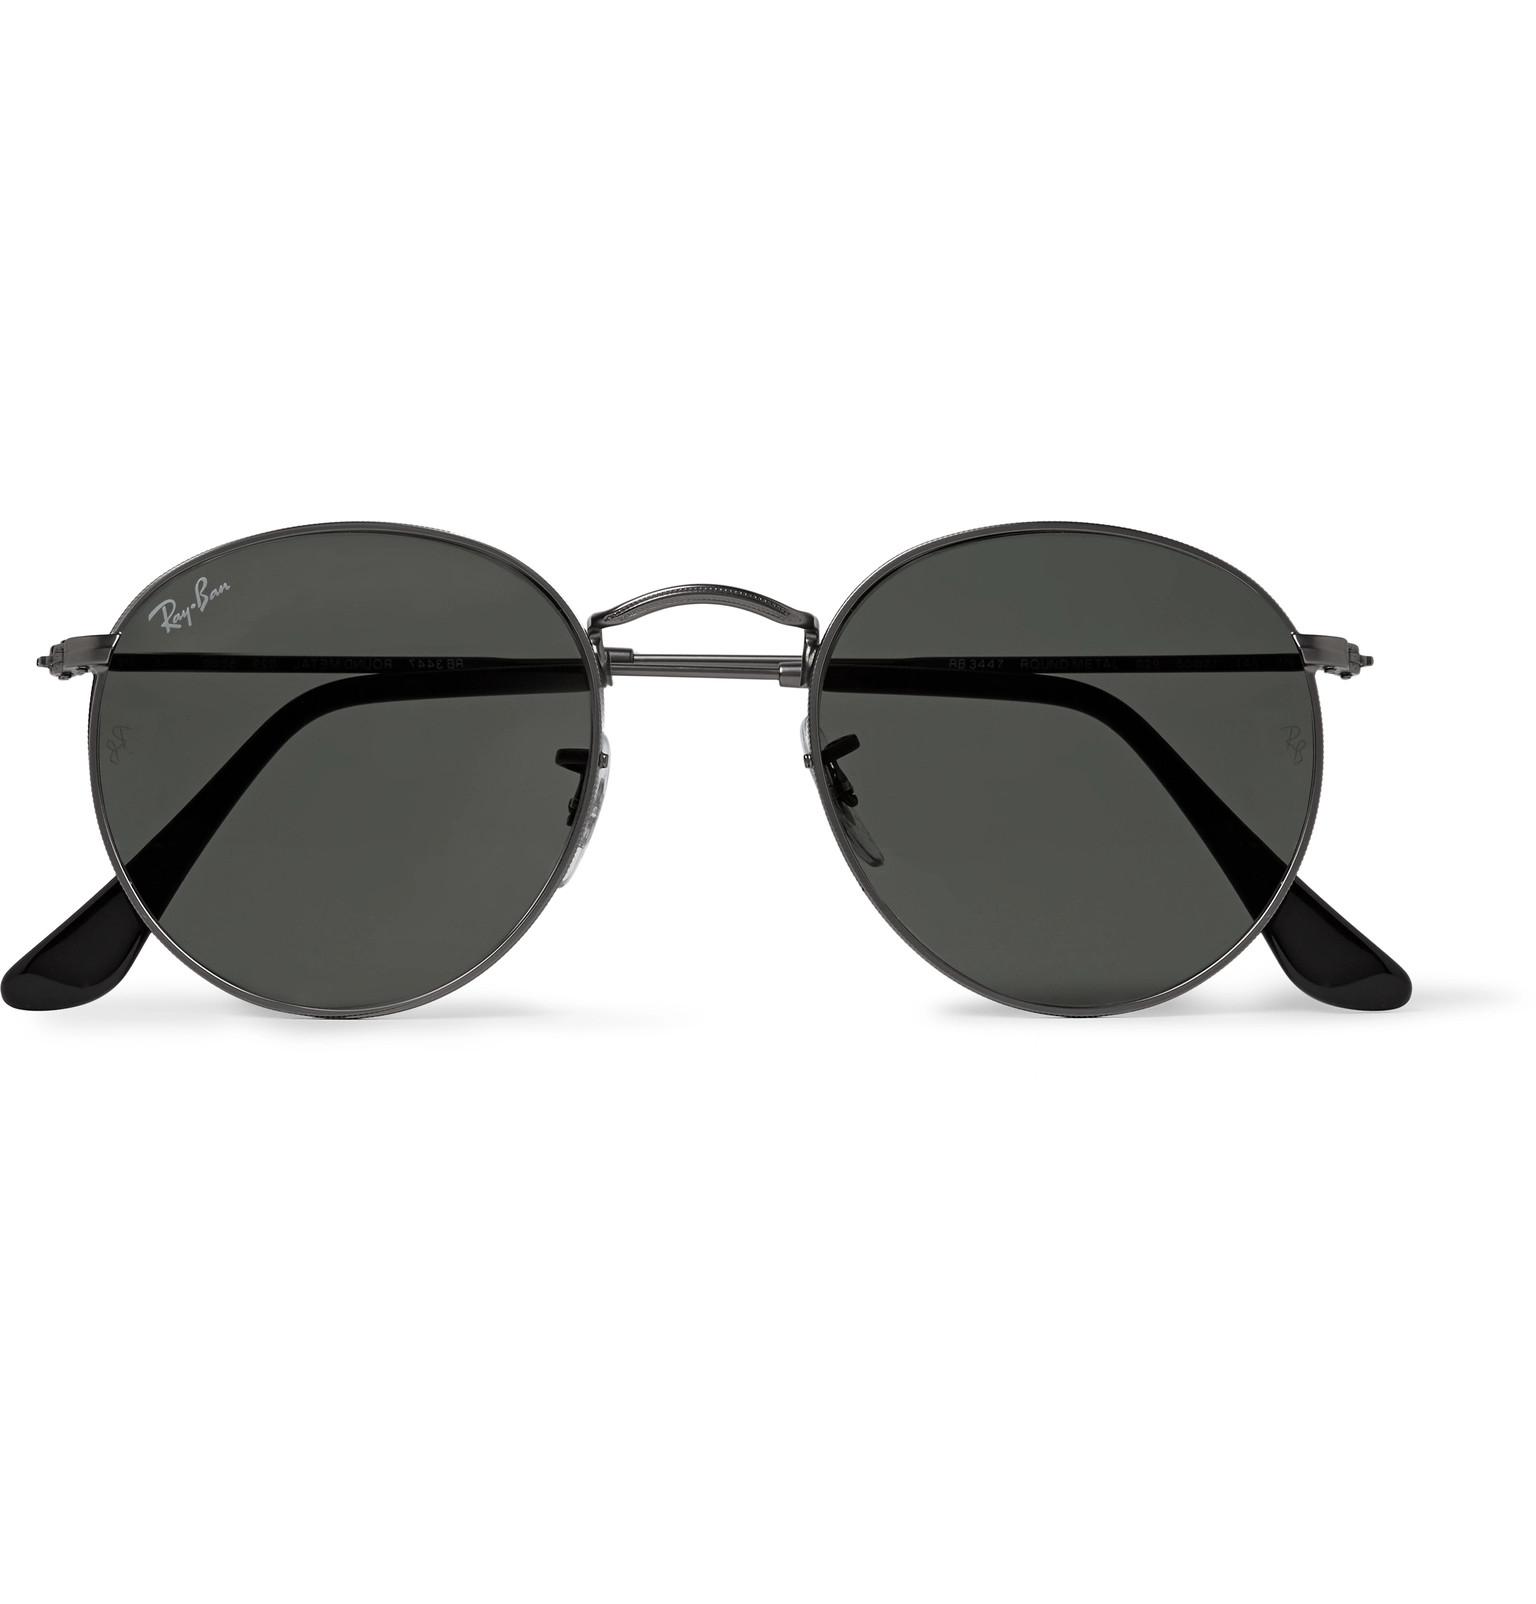 99feb79c94ff Ray-Ban - Round-Frame Gunmetal-Tone Sunglasses